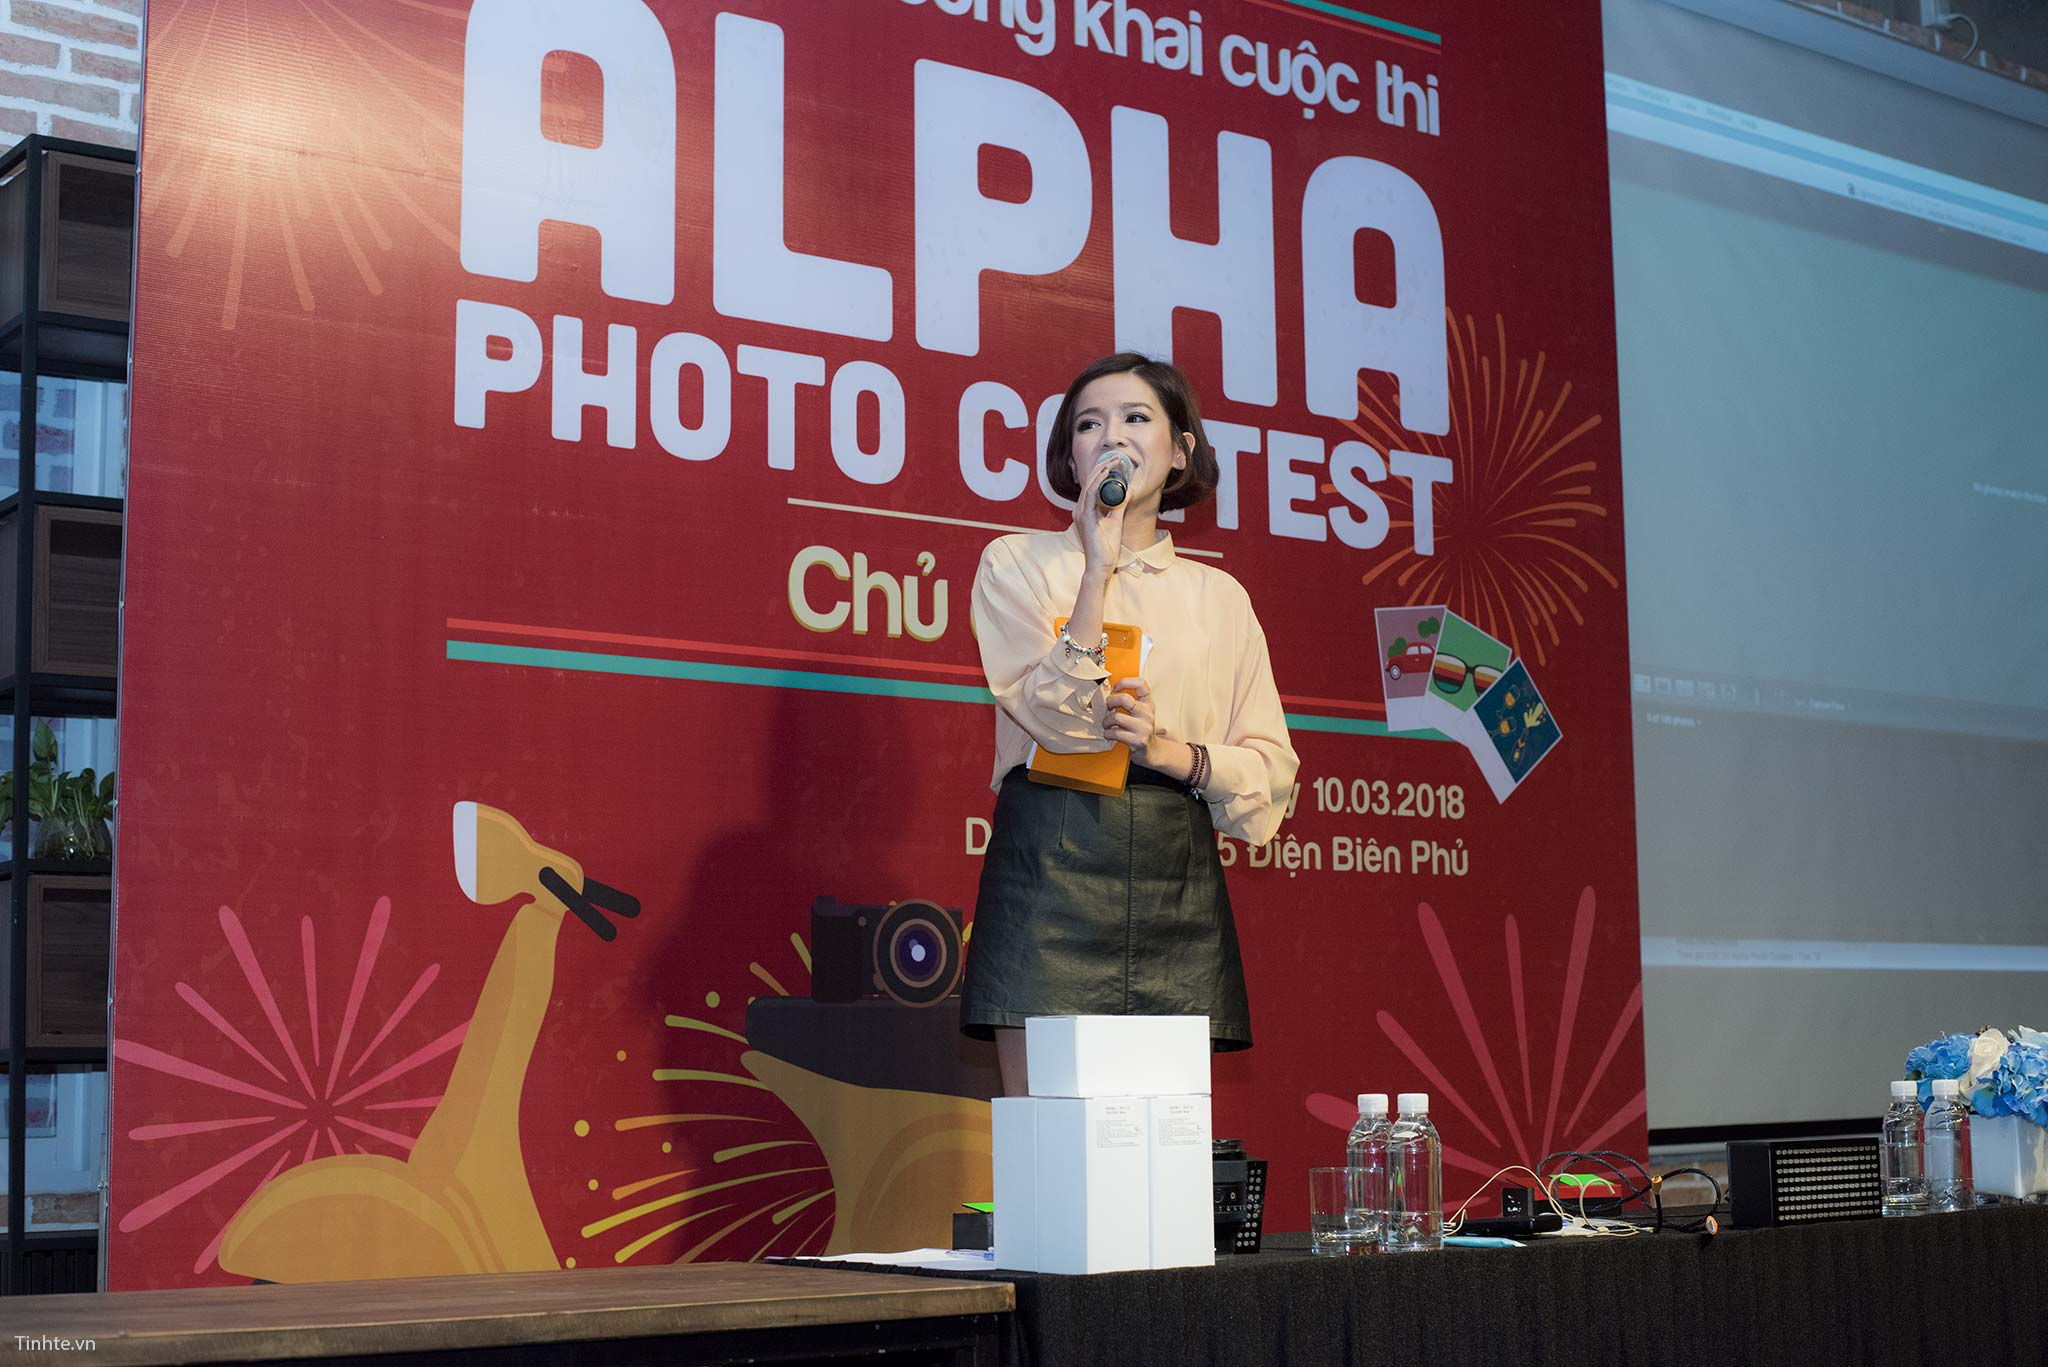 alphaphotocontest-camera.tinhte.vn-29.jpg